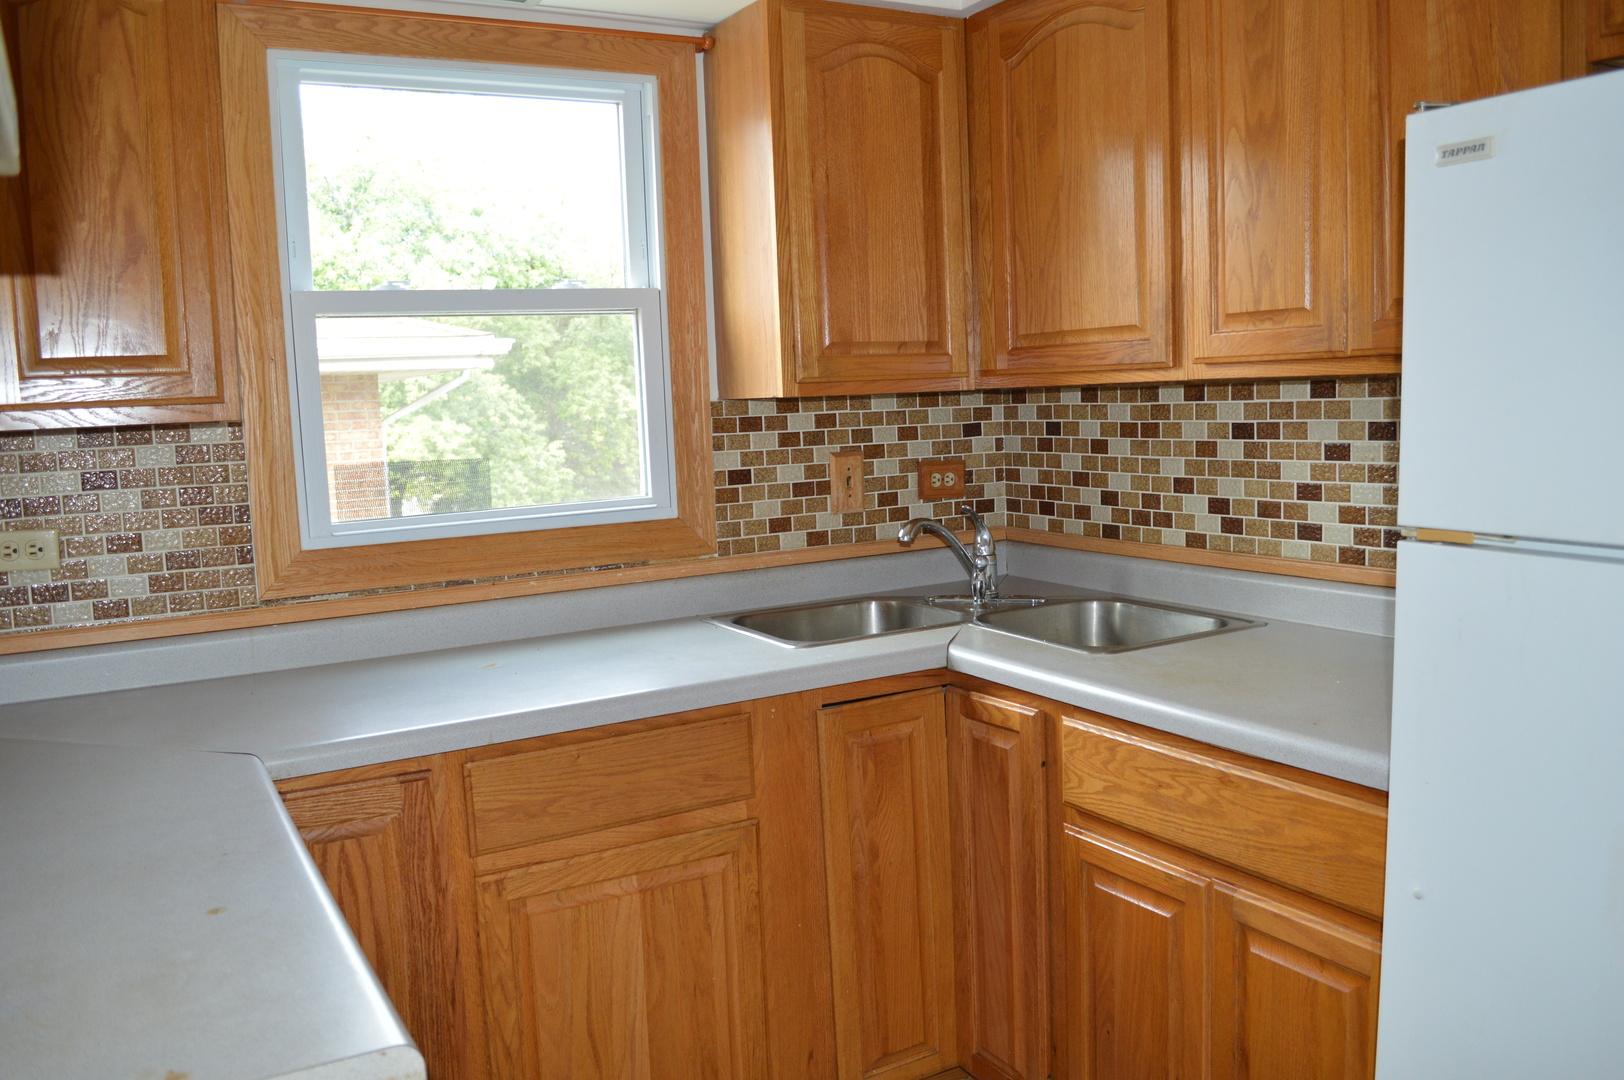 6413 West Home 12B, Worth, Illinois, 60482